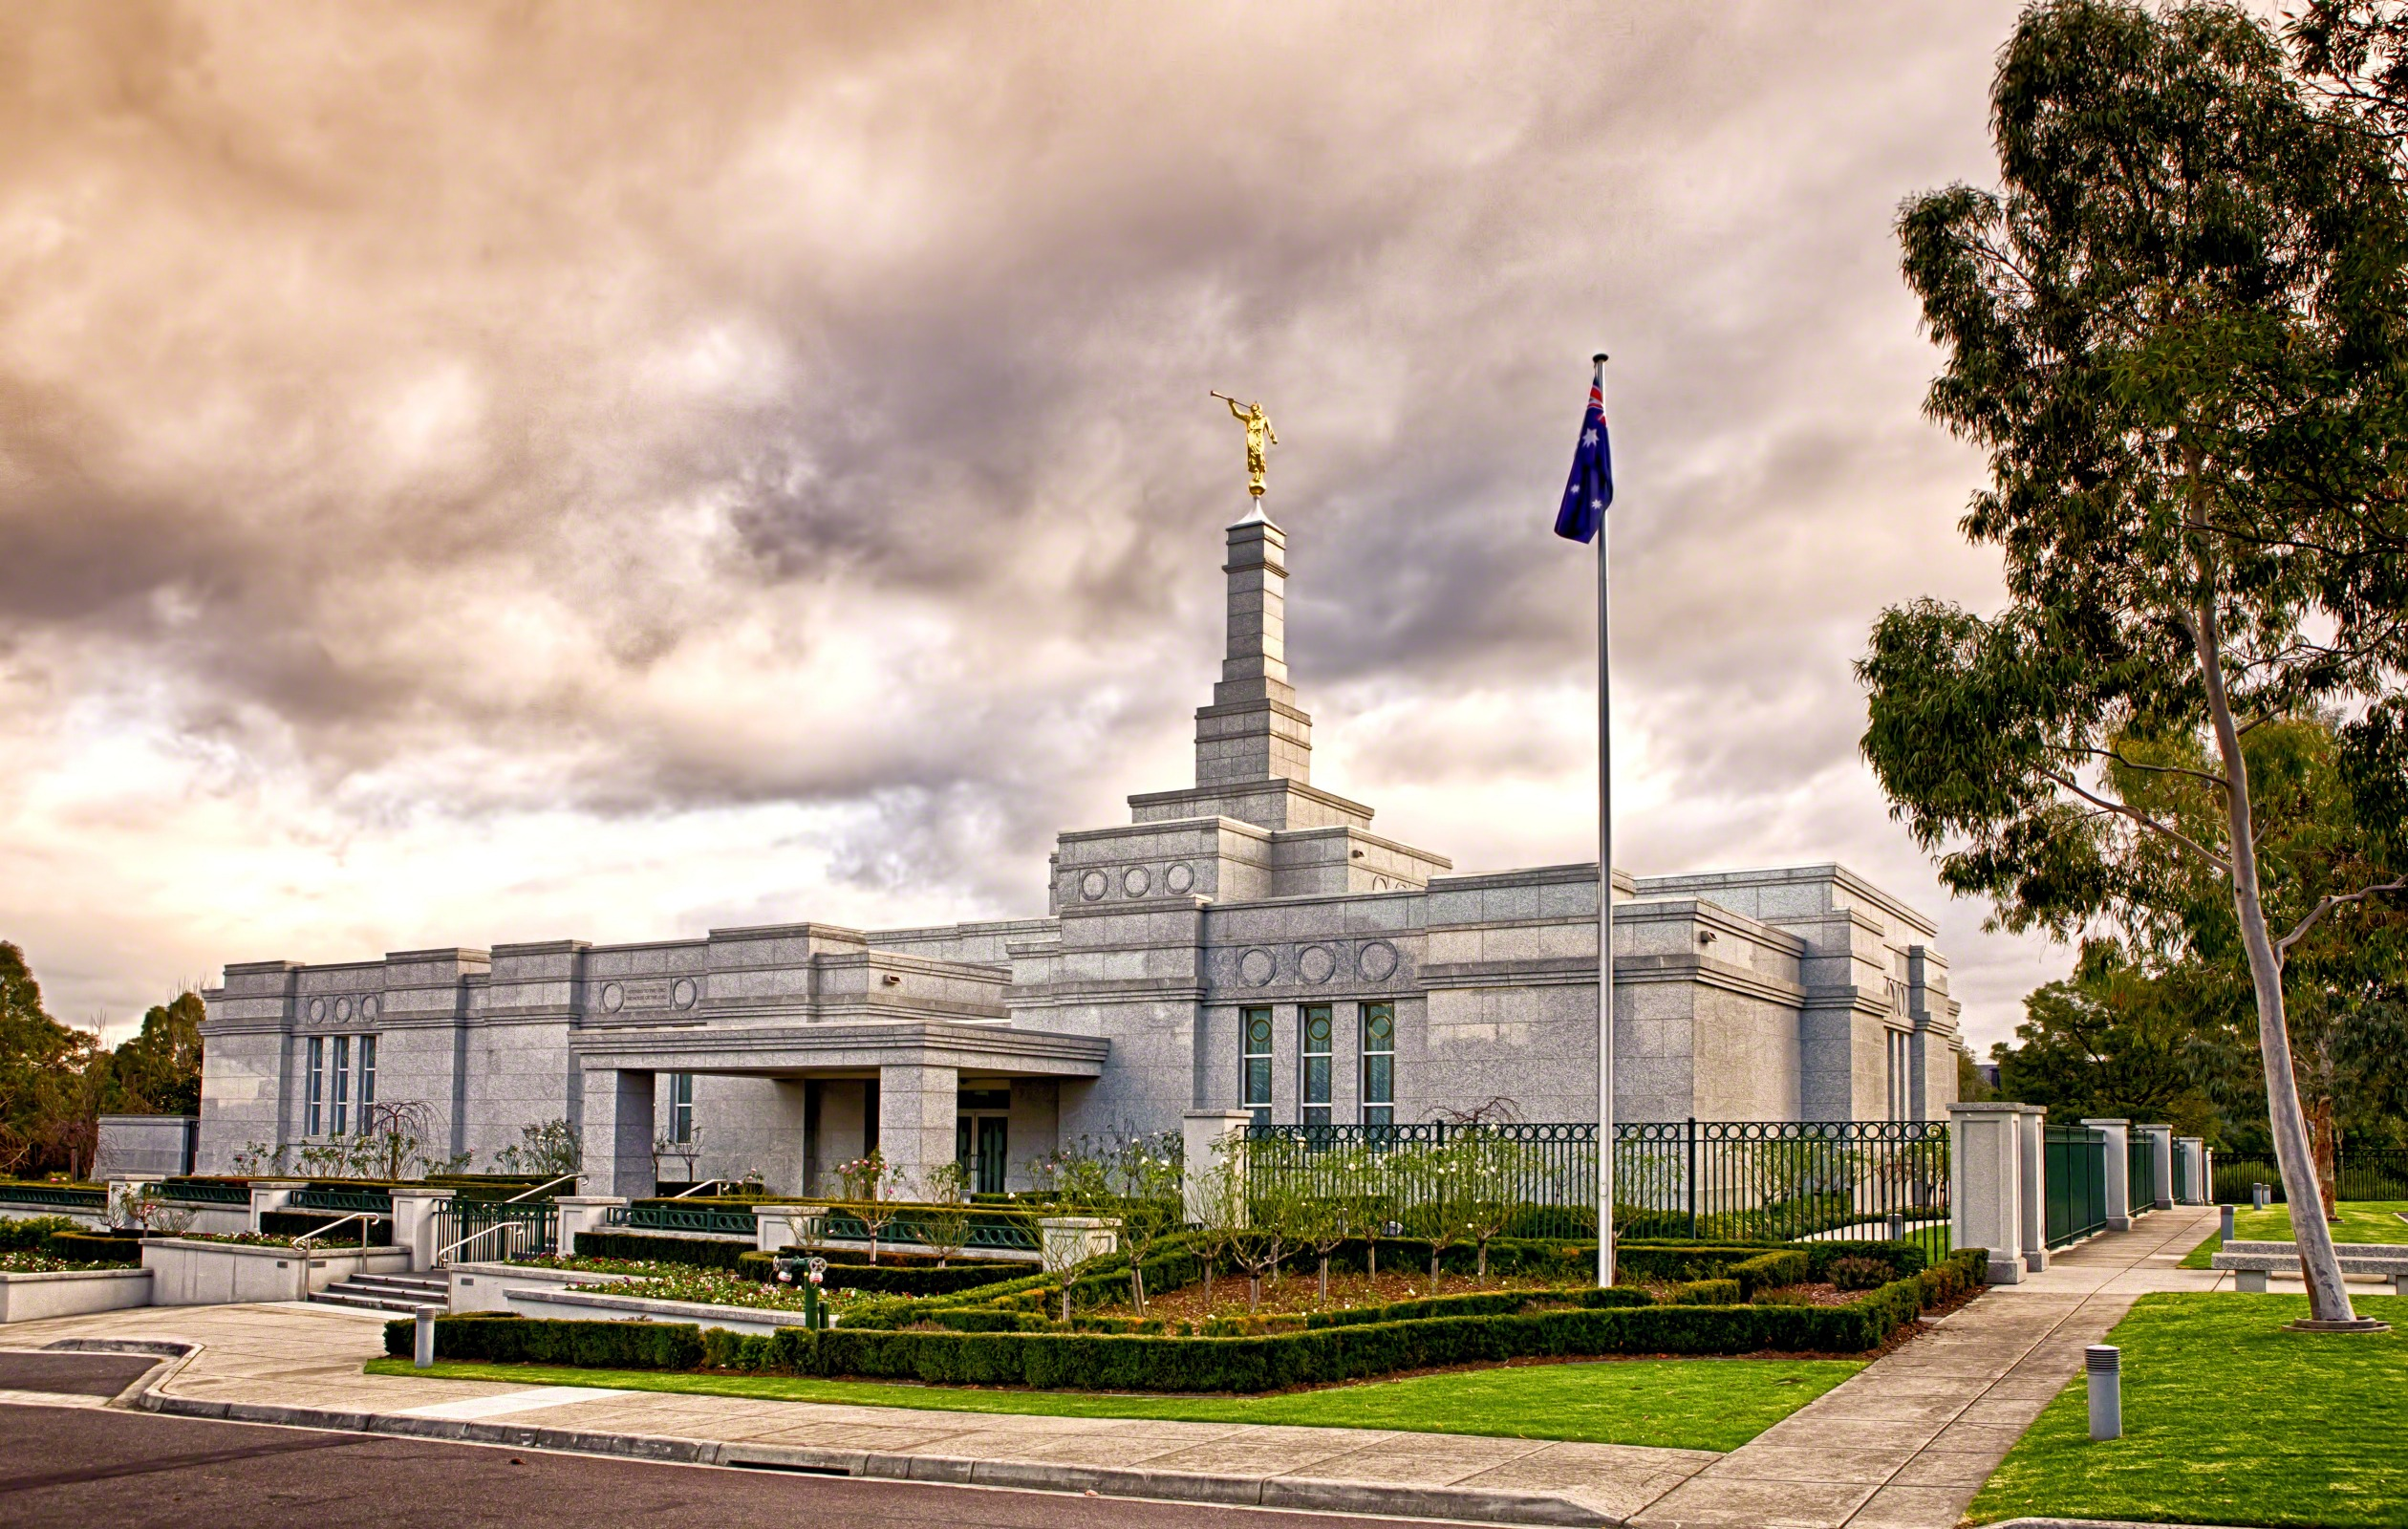 Jesus death date in Melbourne